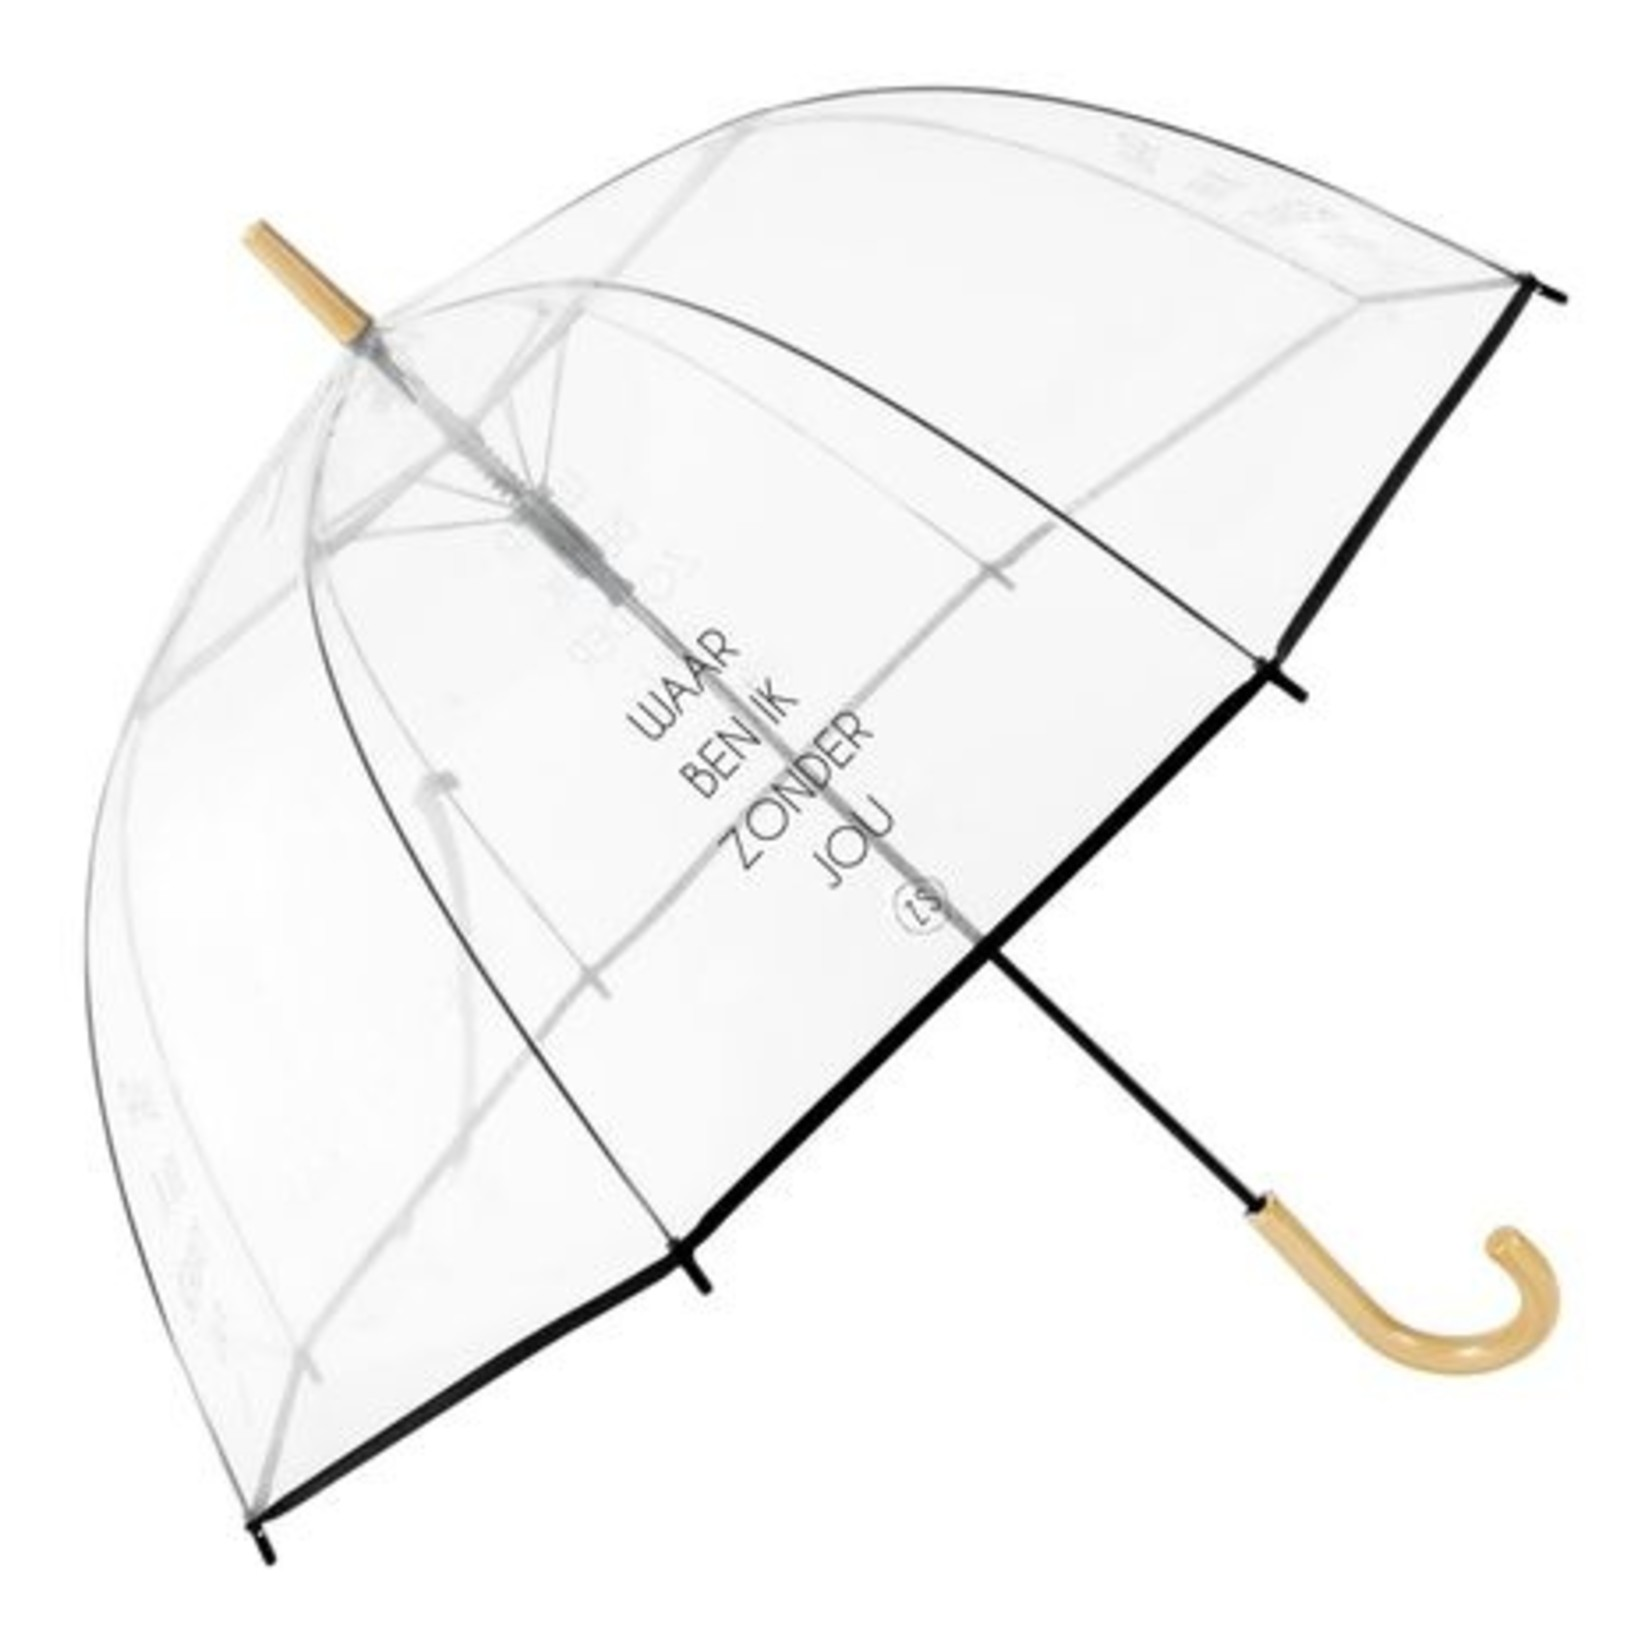 Zusss Paraplu - Lang - Waar ben ik zonder jou